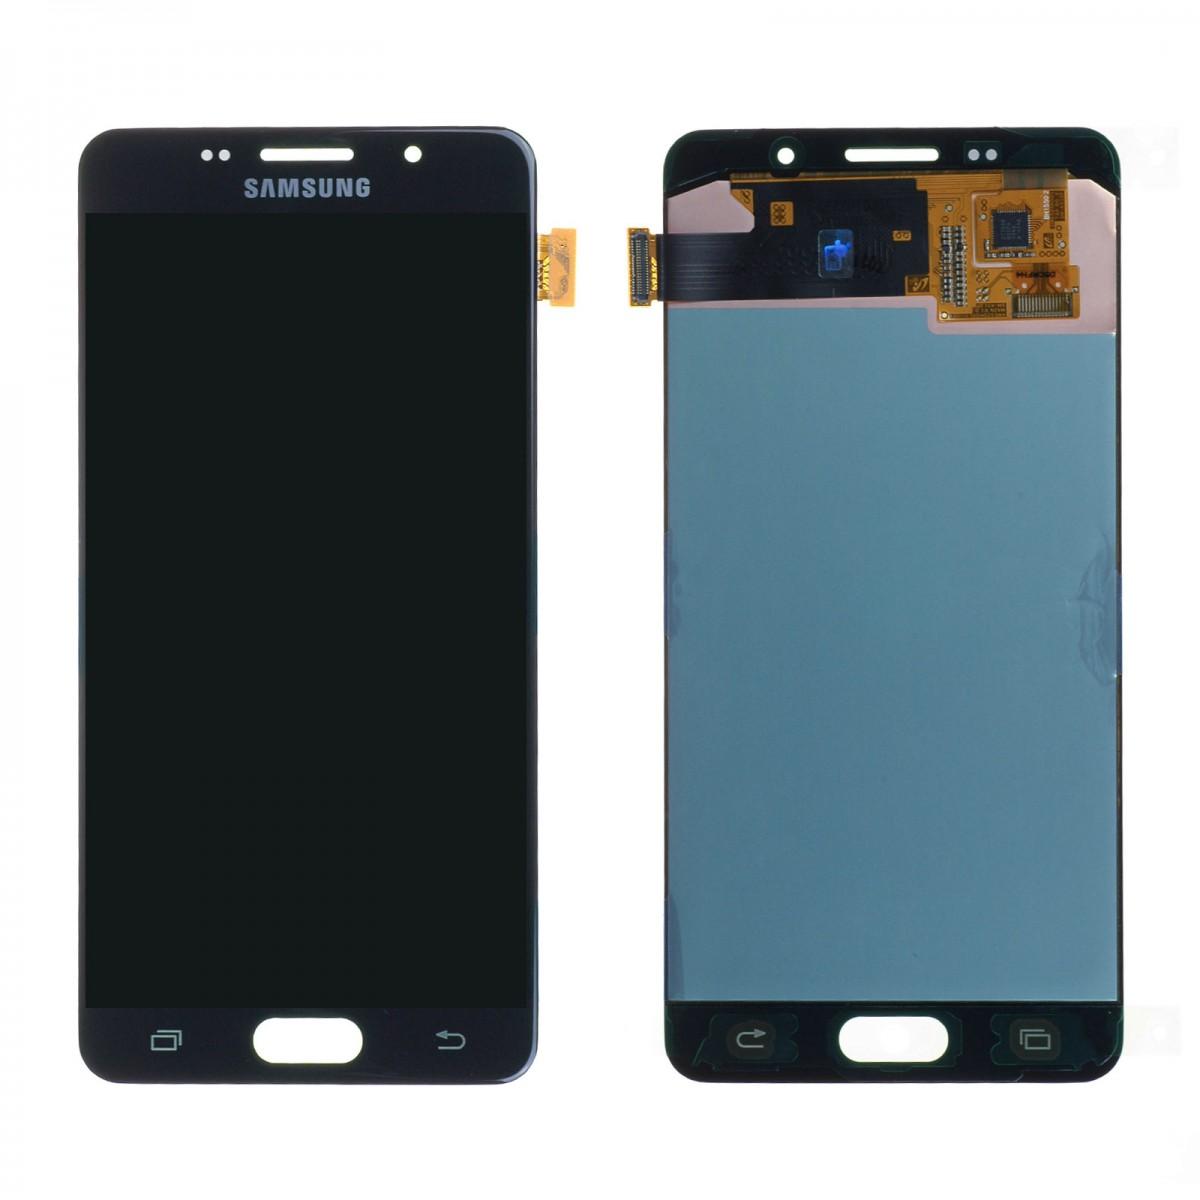 Cran samsung galaxy a5 2016 a510f noir origine achat for Photo ecran samsung a5